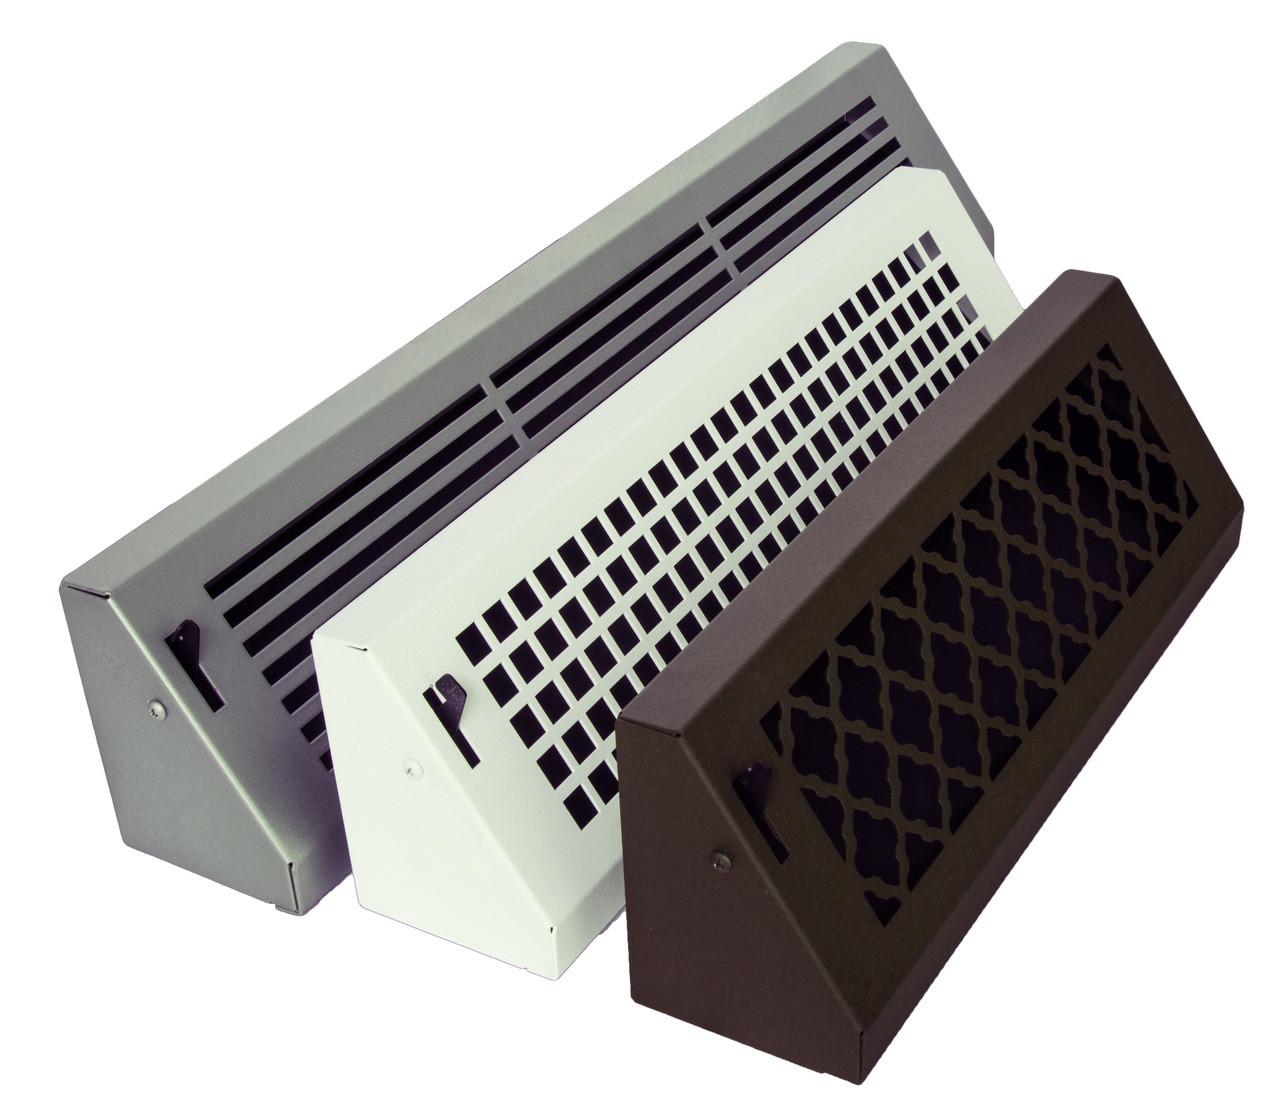 Baseboard Register Cover